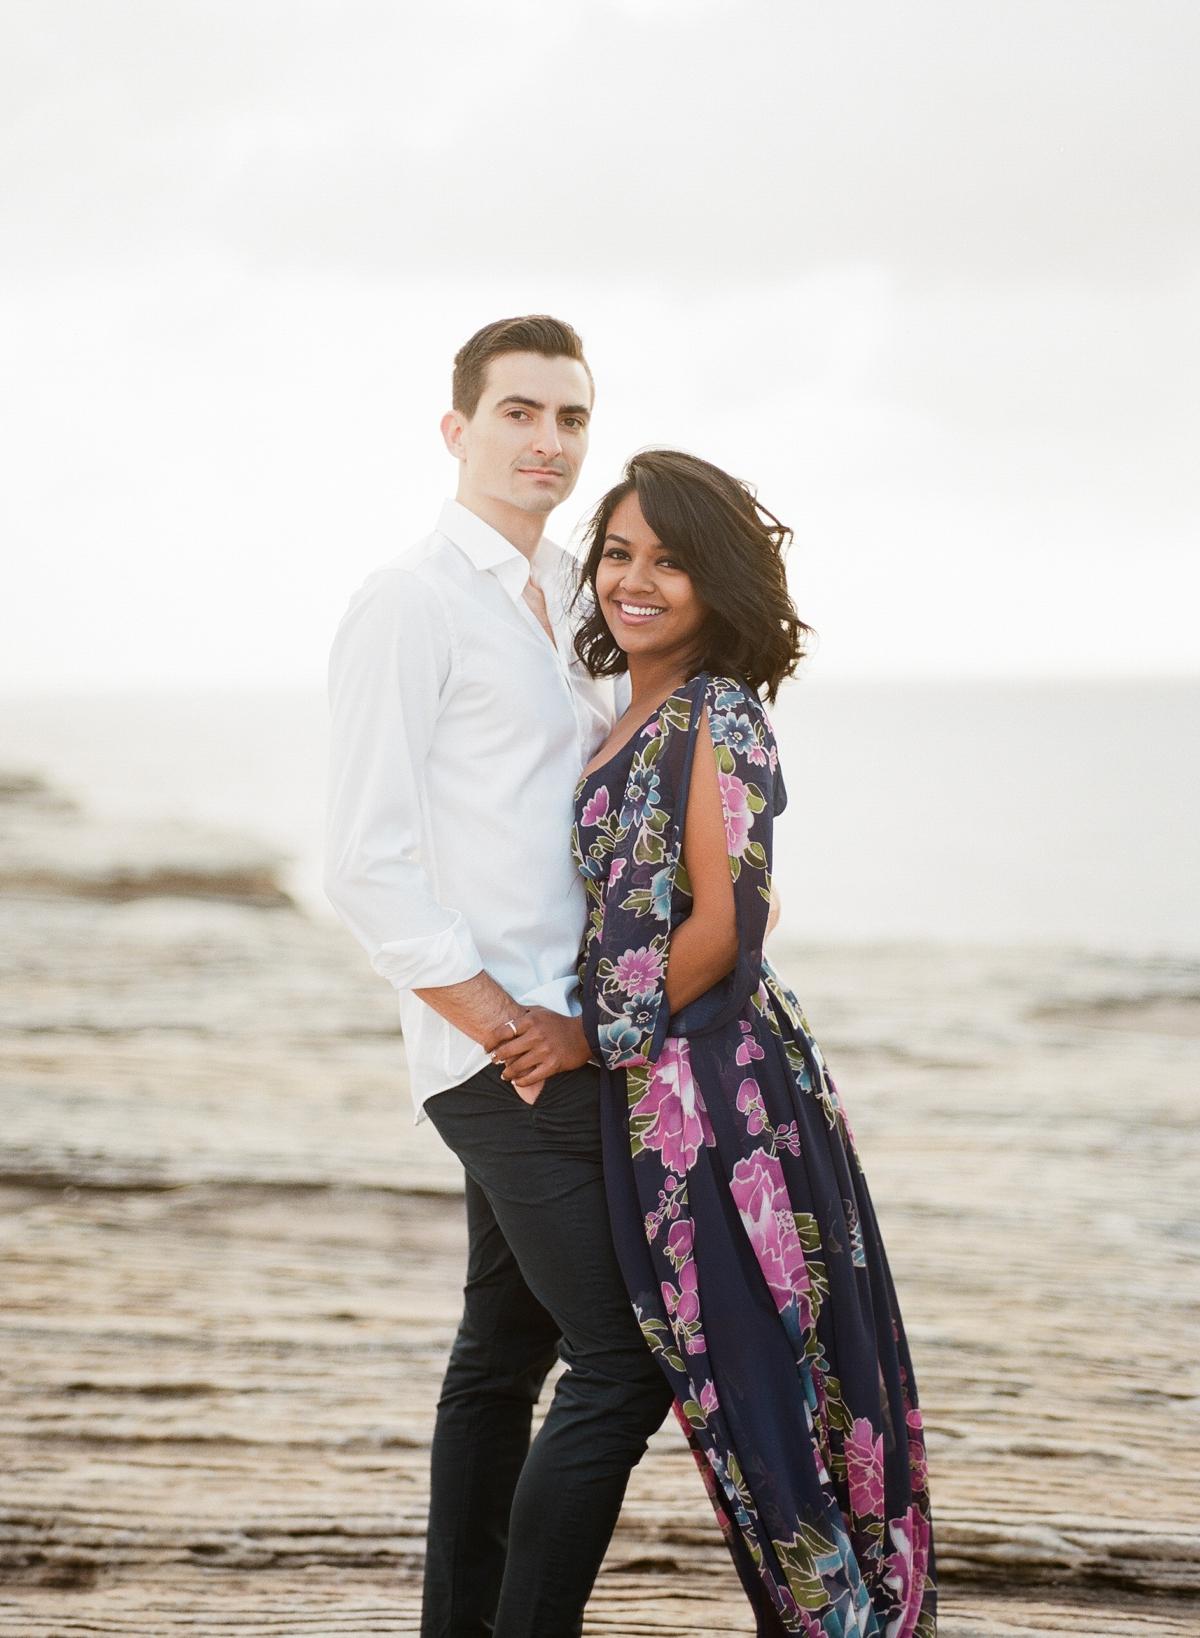 Coastal Sydney couples session by Mr Edwards Photography_0737_1174.jpg